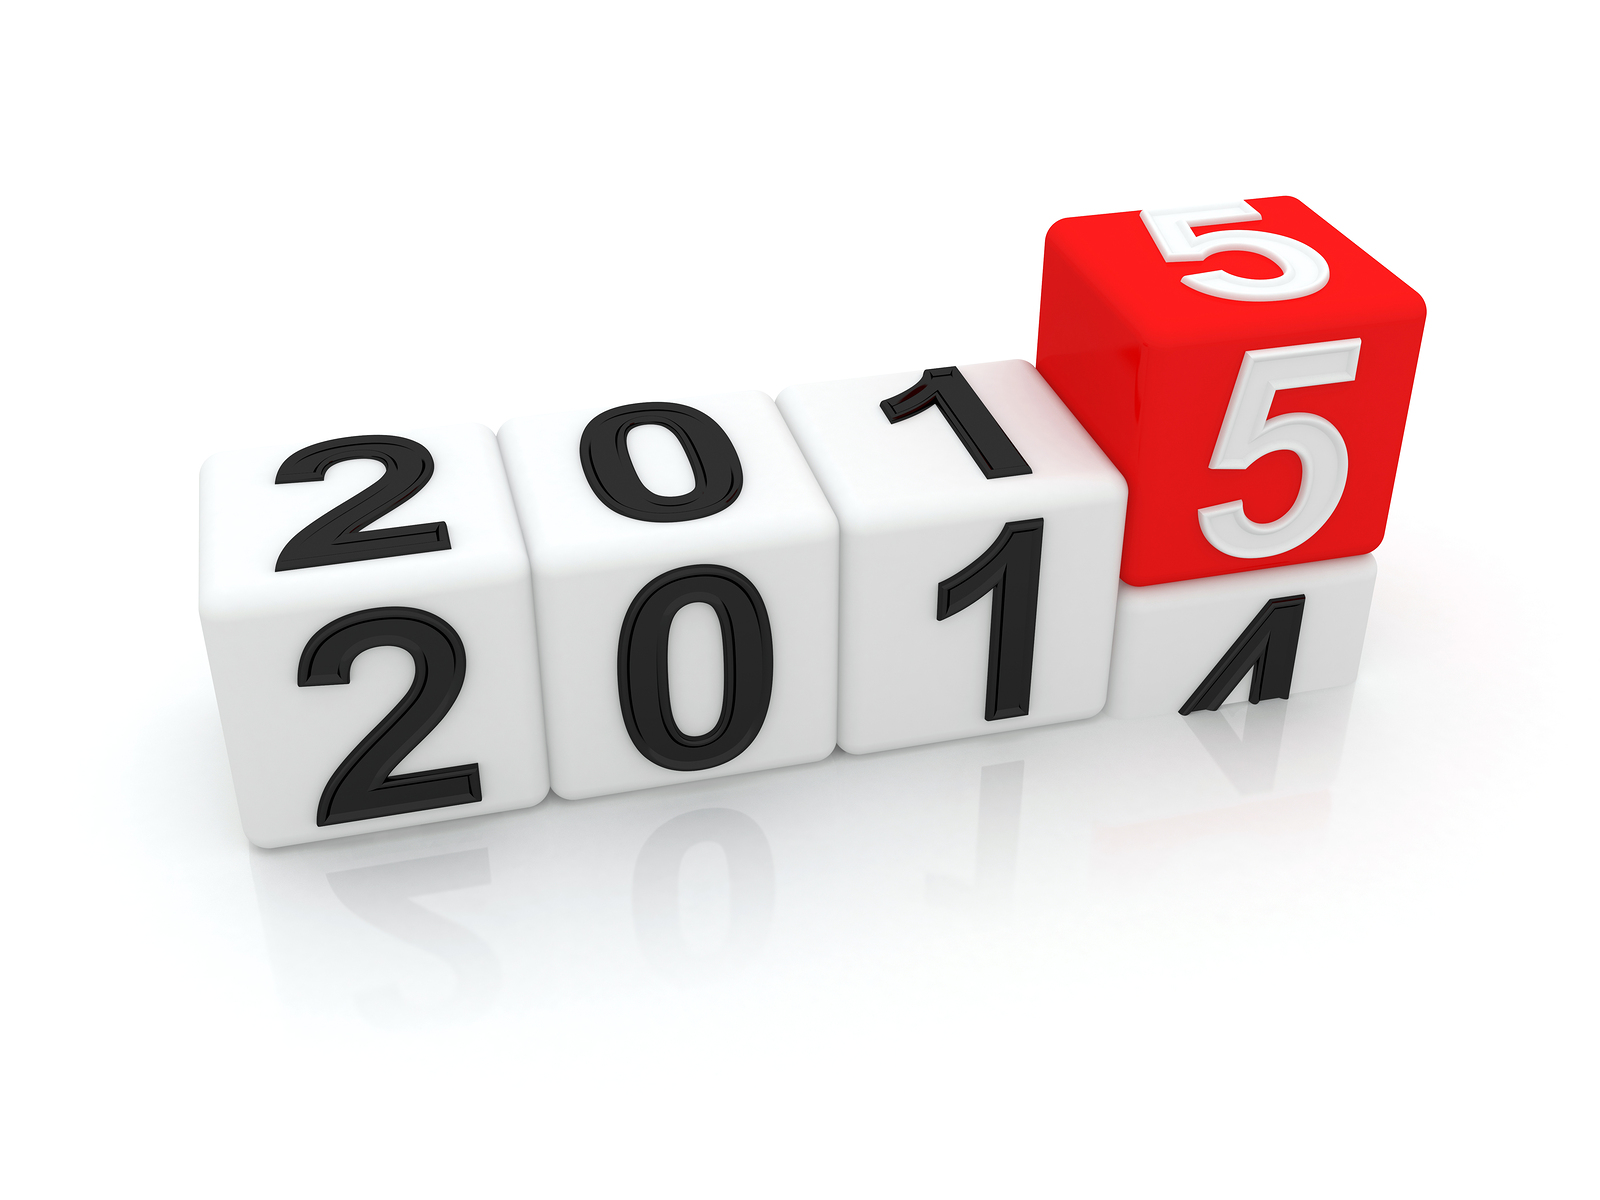 2015nw.jpg